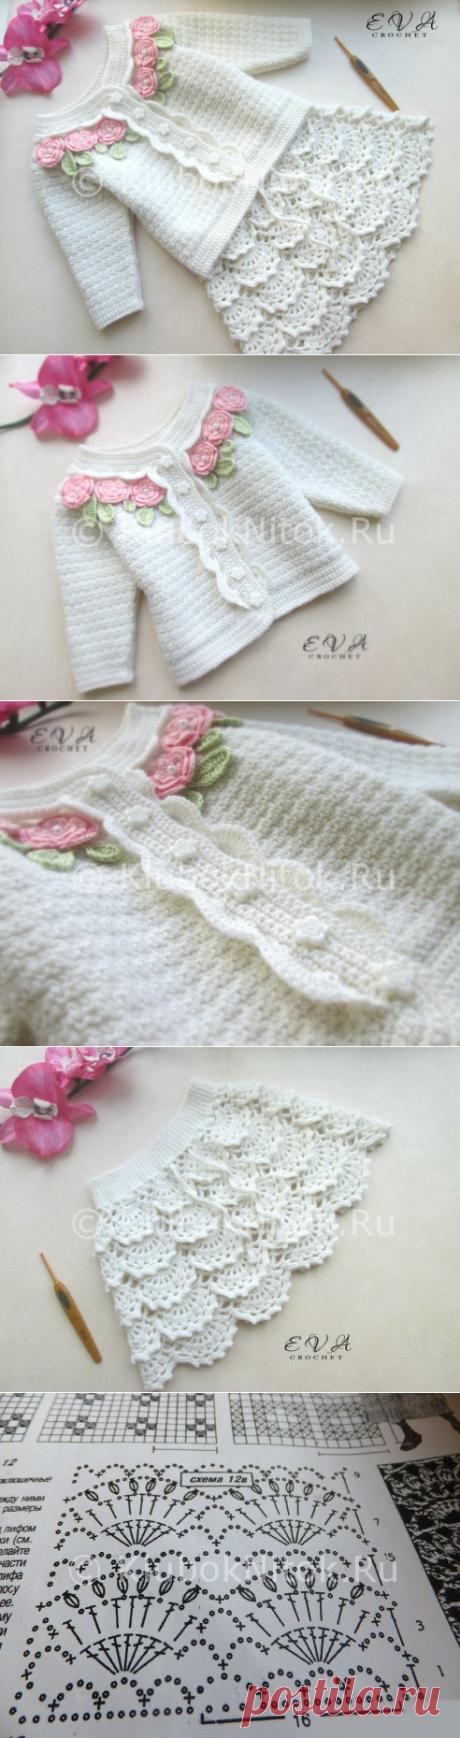 Buscar Posts Crochet Flower Motif Motivos Hexagonales Pinterest Kostyumchik De Eva La Labor Punto Para Las Muchachas